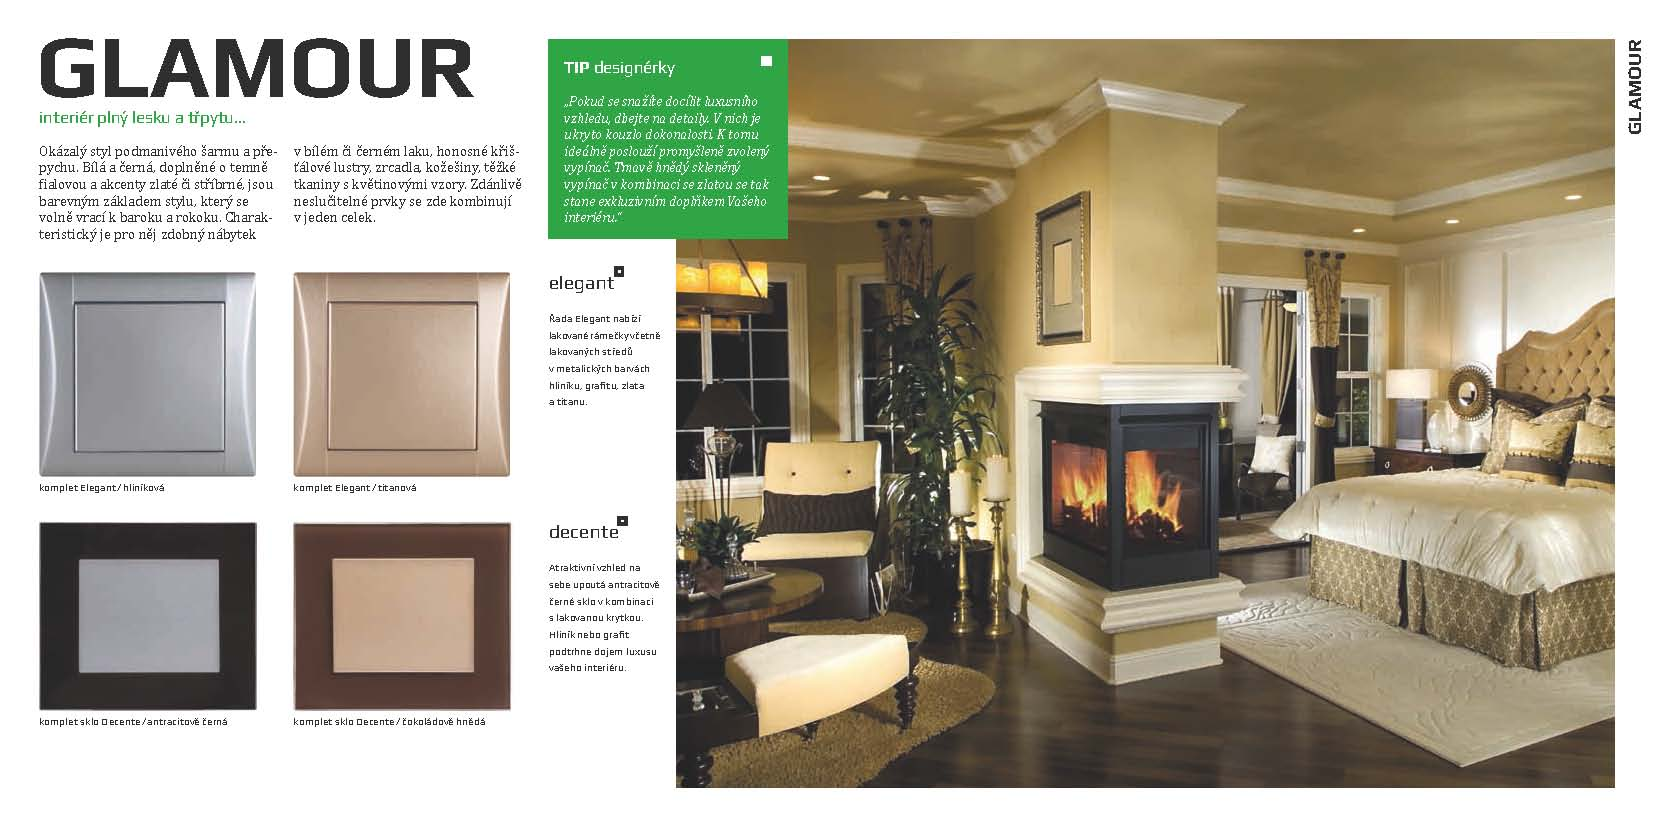 Home Design Zlín Part - 32: Home Switch Elegant Home Switch Variant Home Switch Elegant And Decente